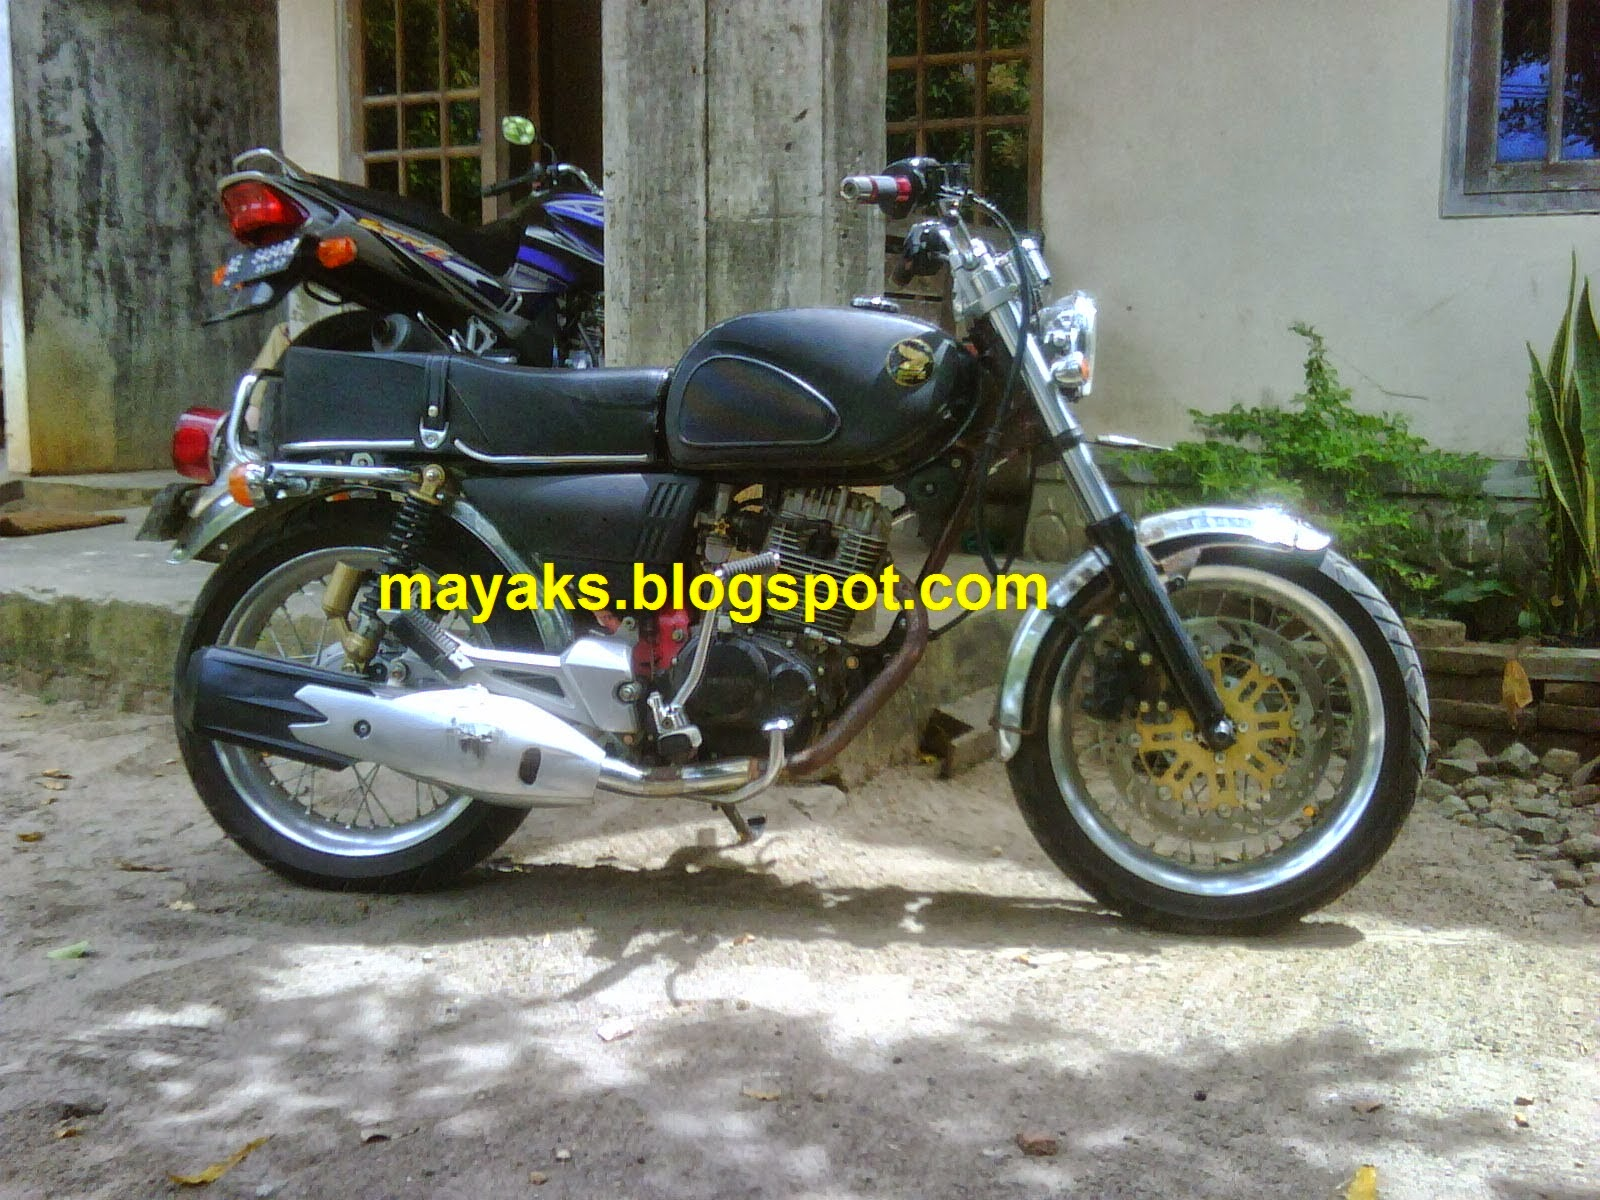 103 Modifikasi Motor Honda Cb Dream Modifikasi Motor Honda CB Terbaru